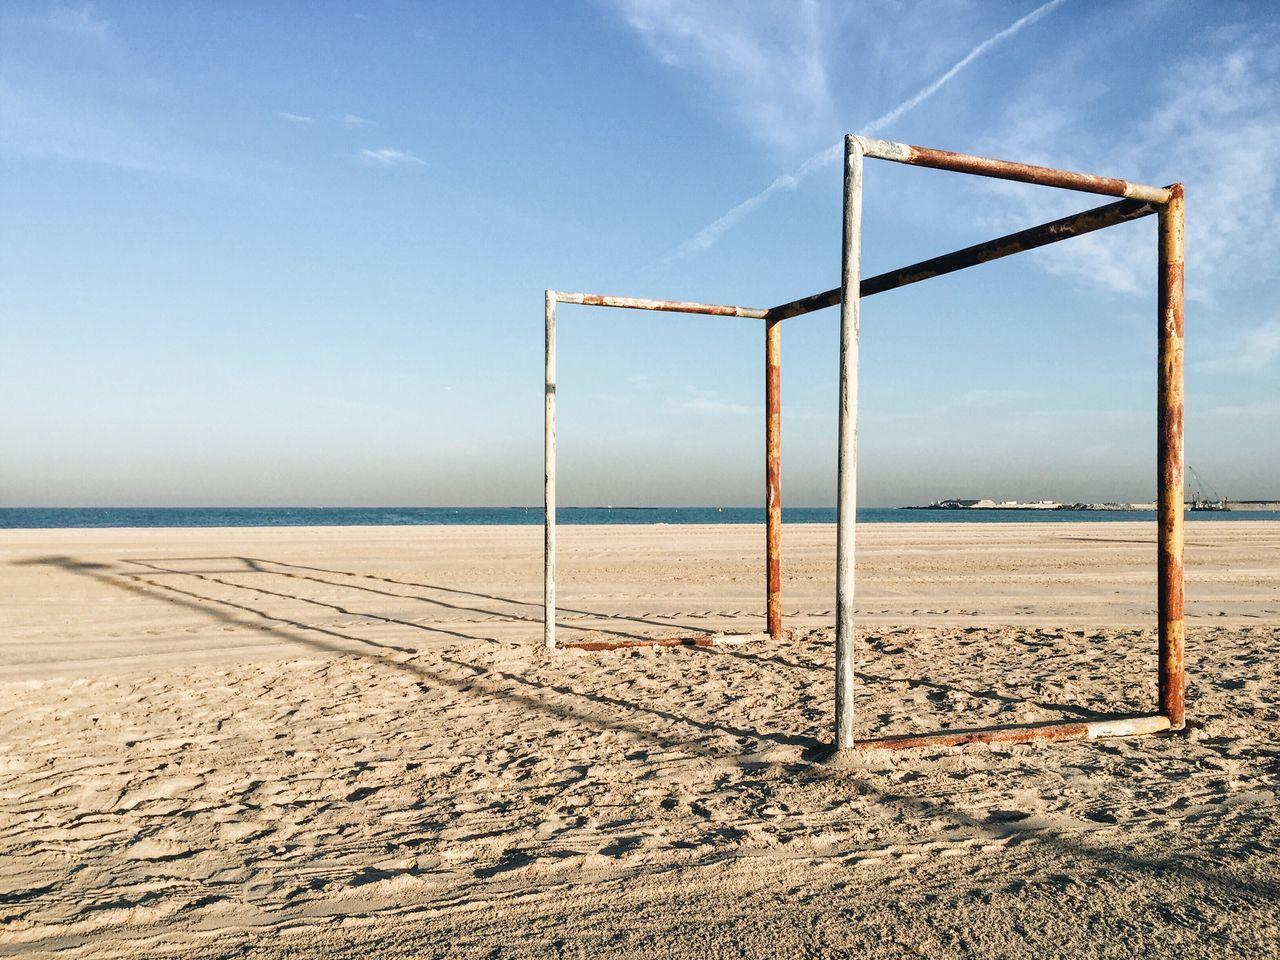 Beautiful stock photos of dubai, Dubai, Lifestyles, United Arab Emirates, absence